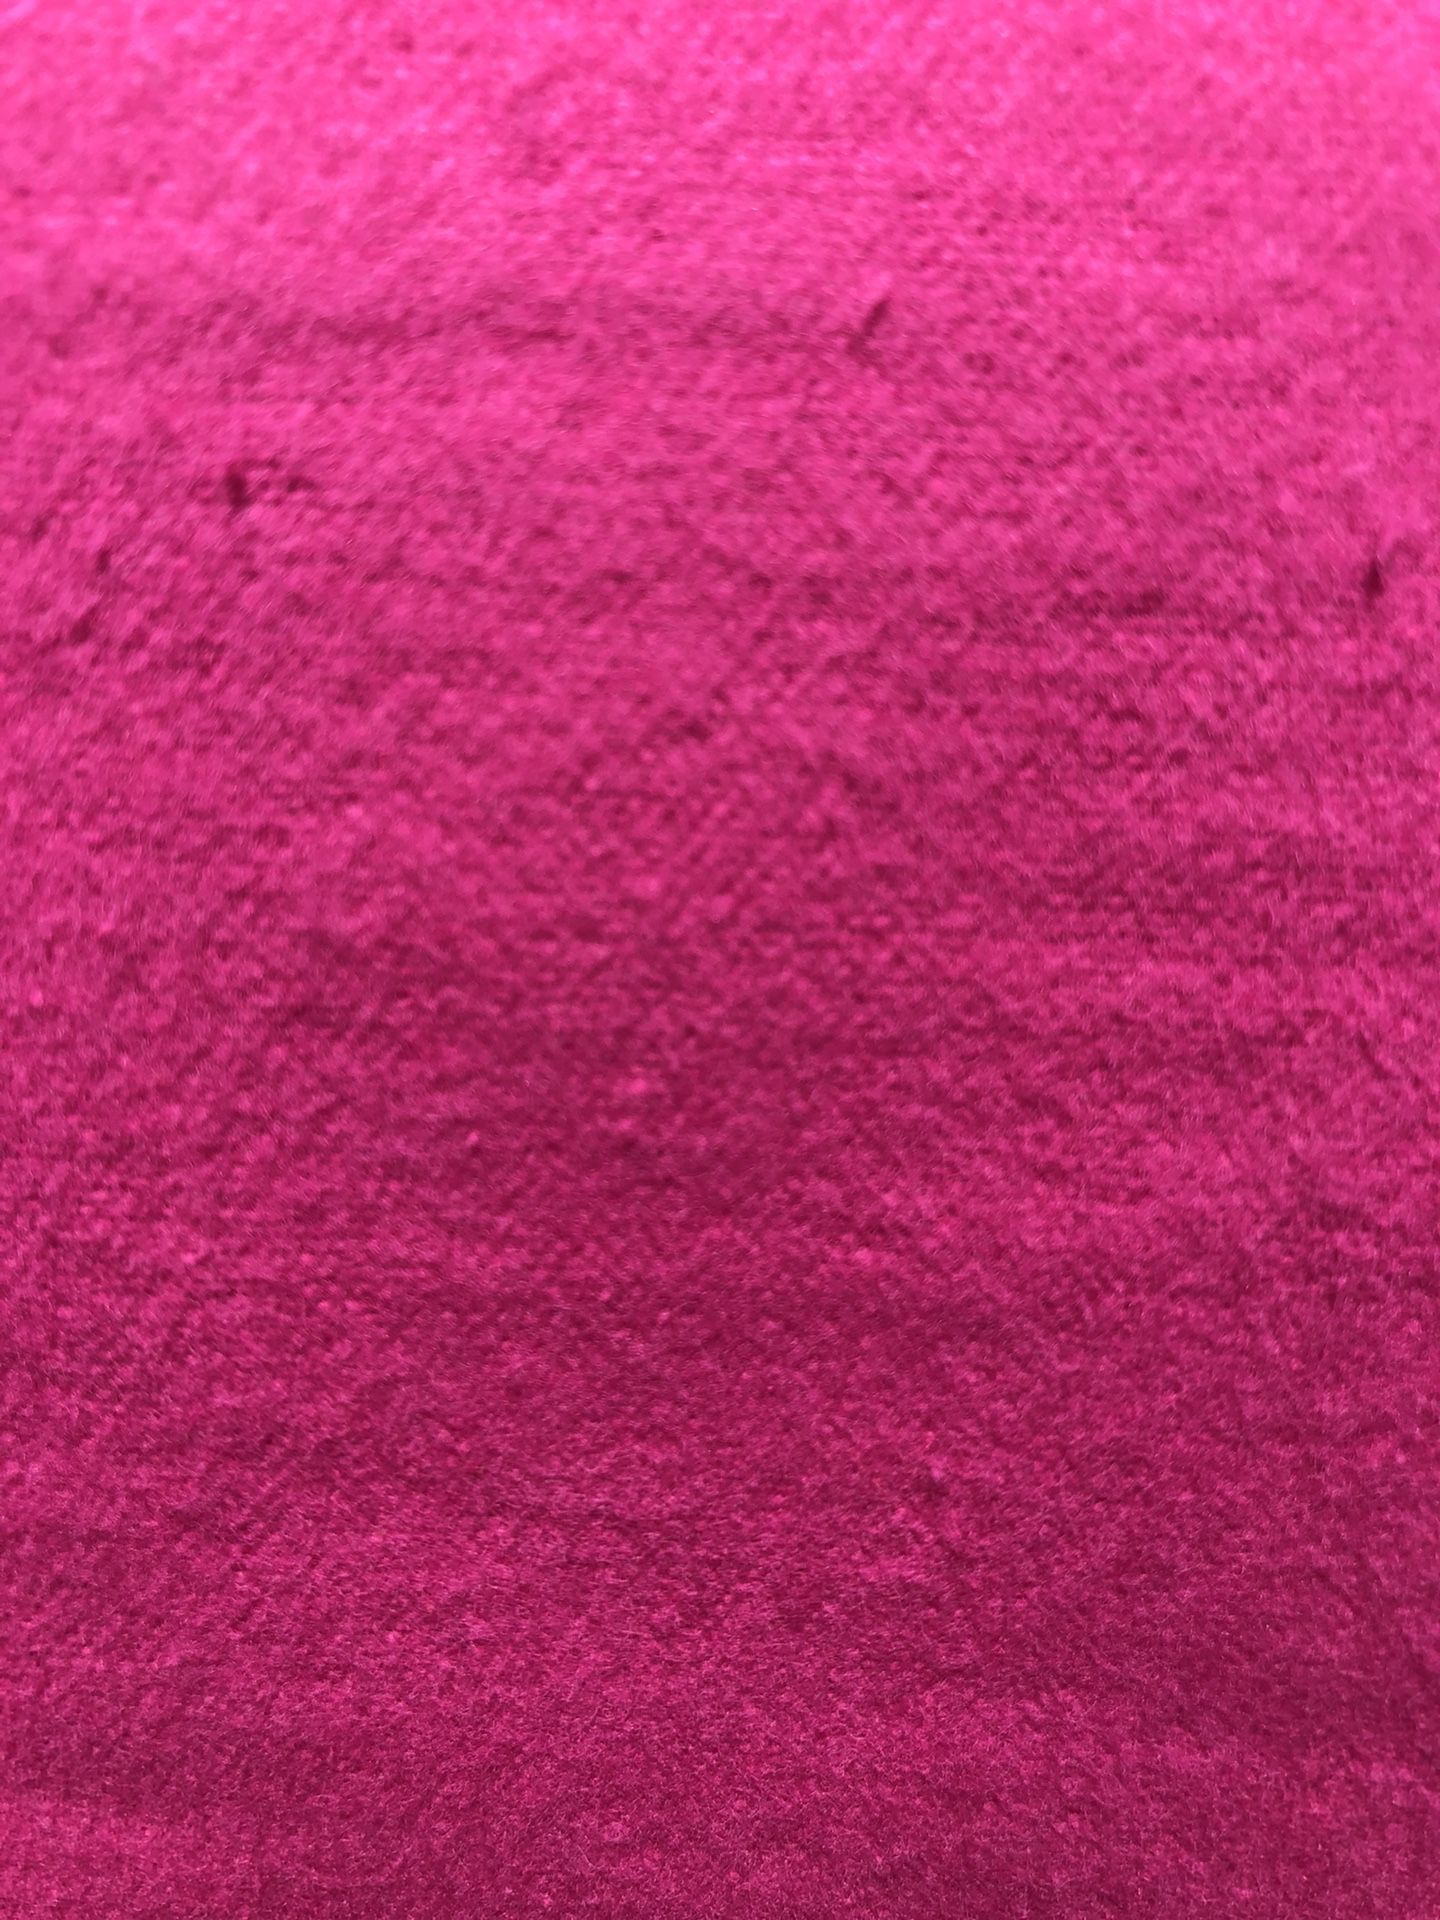 Bright Pink Felt Fabric